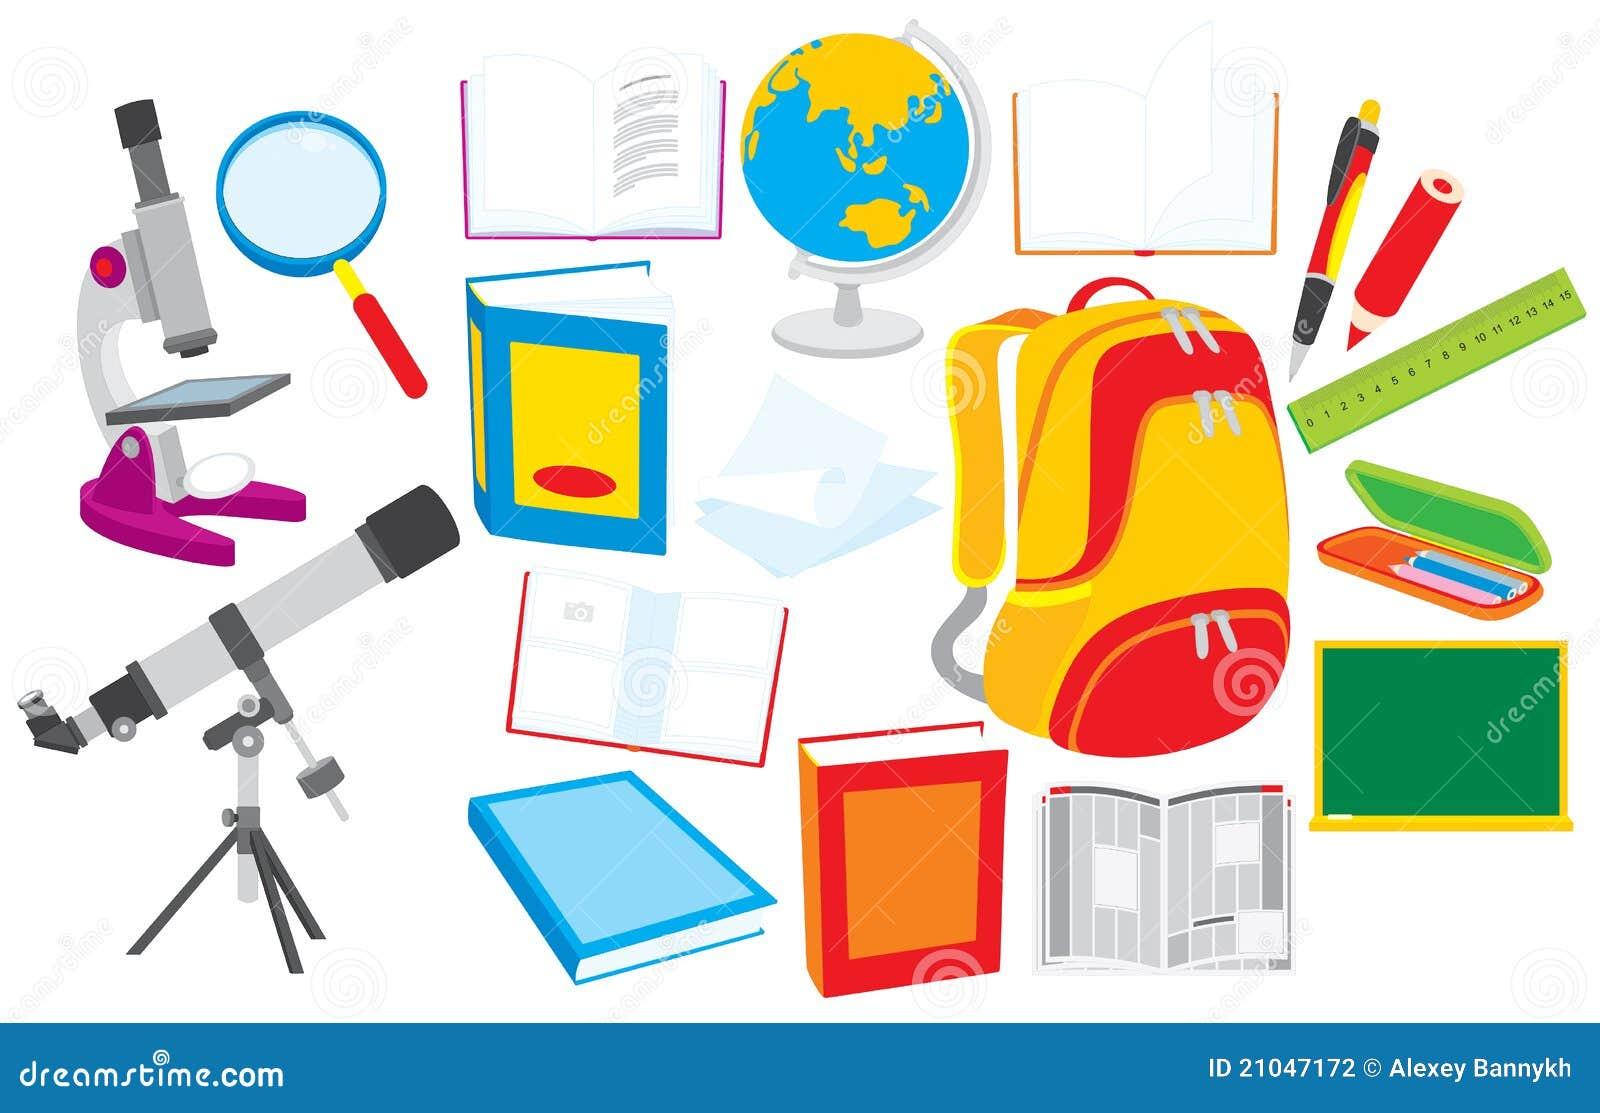 Ранцы портфели рюкзаки Картинки на тему Школа